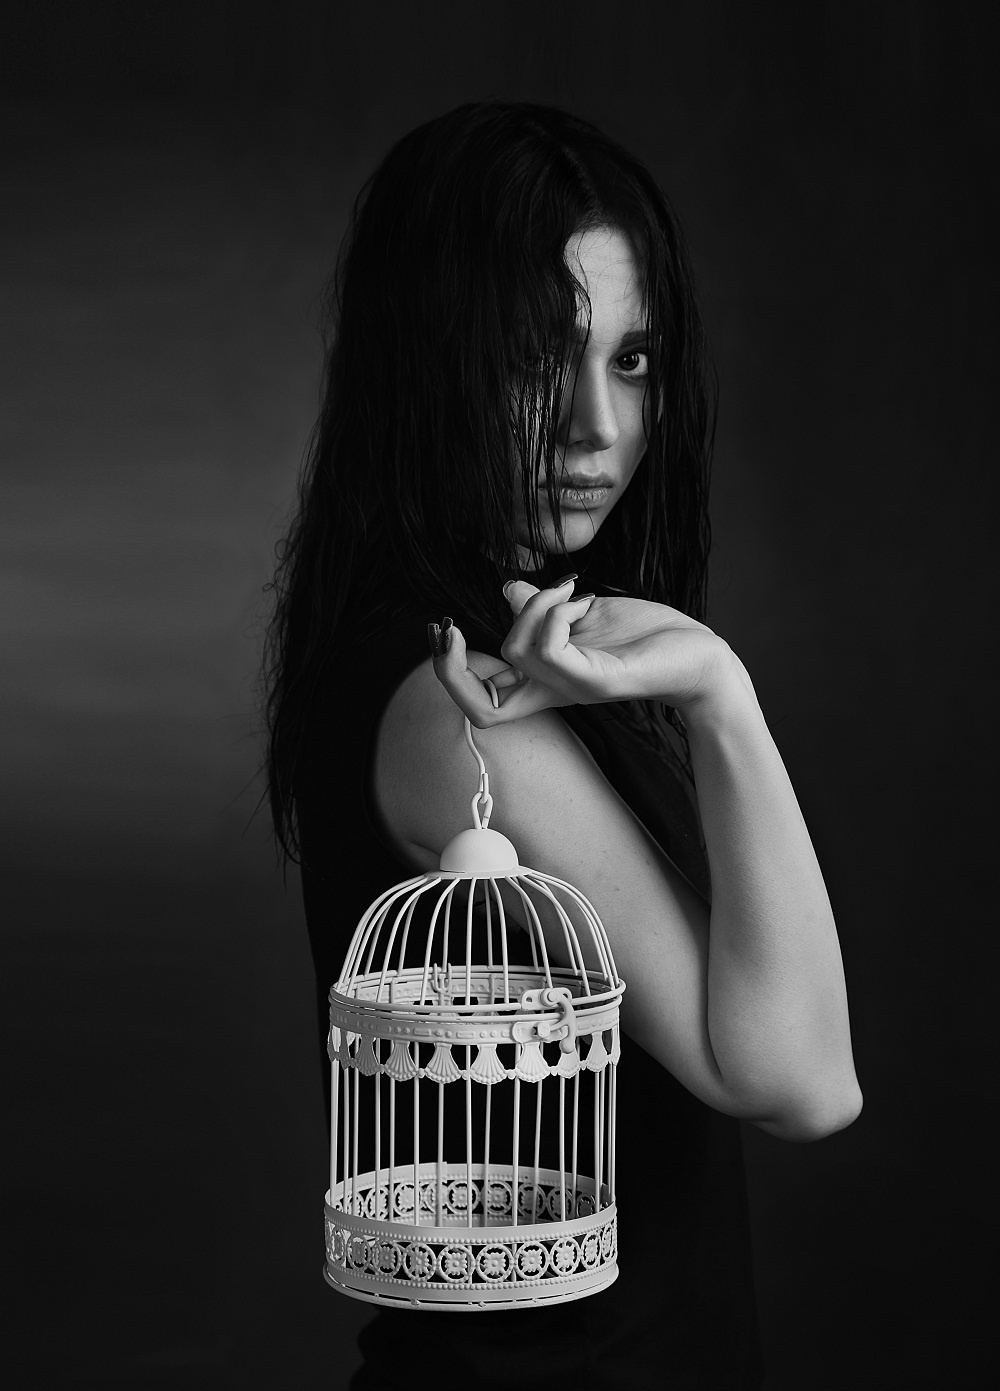 Untitled by Morteza Ghaemi